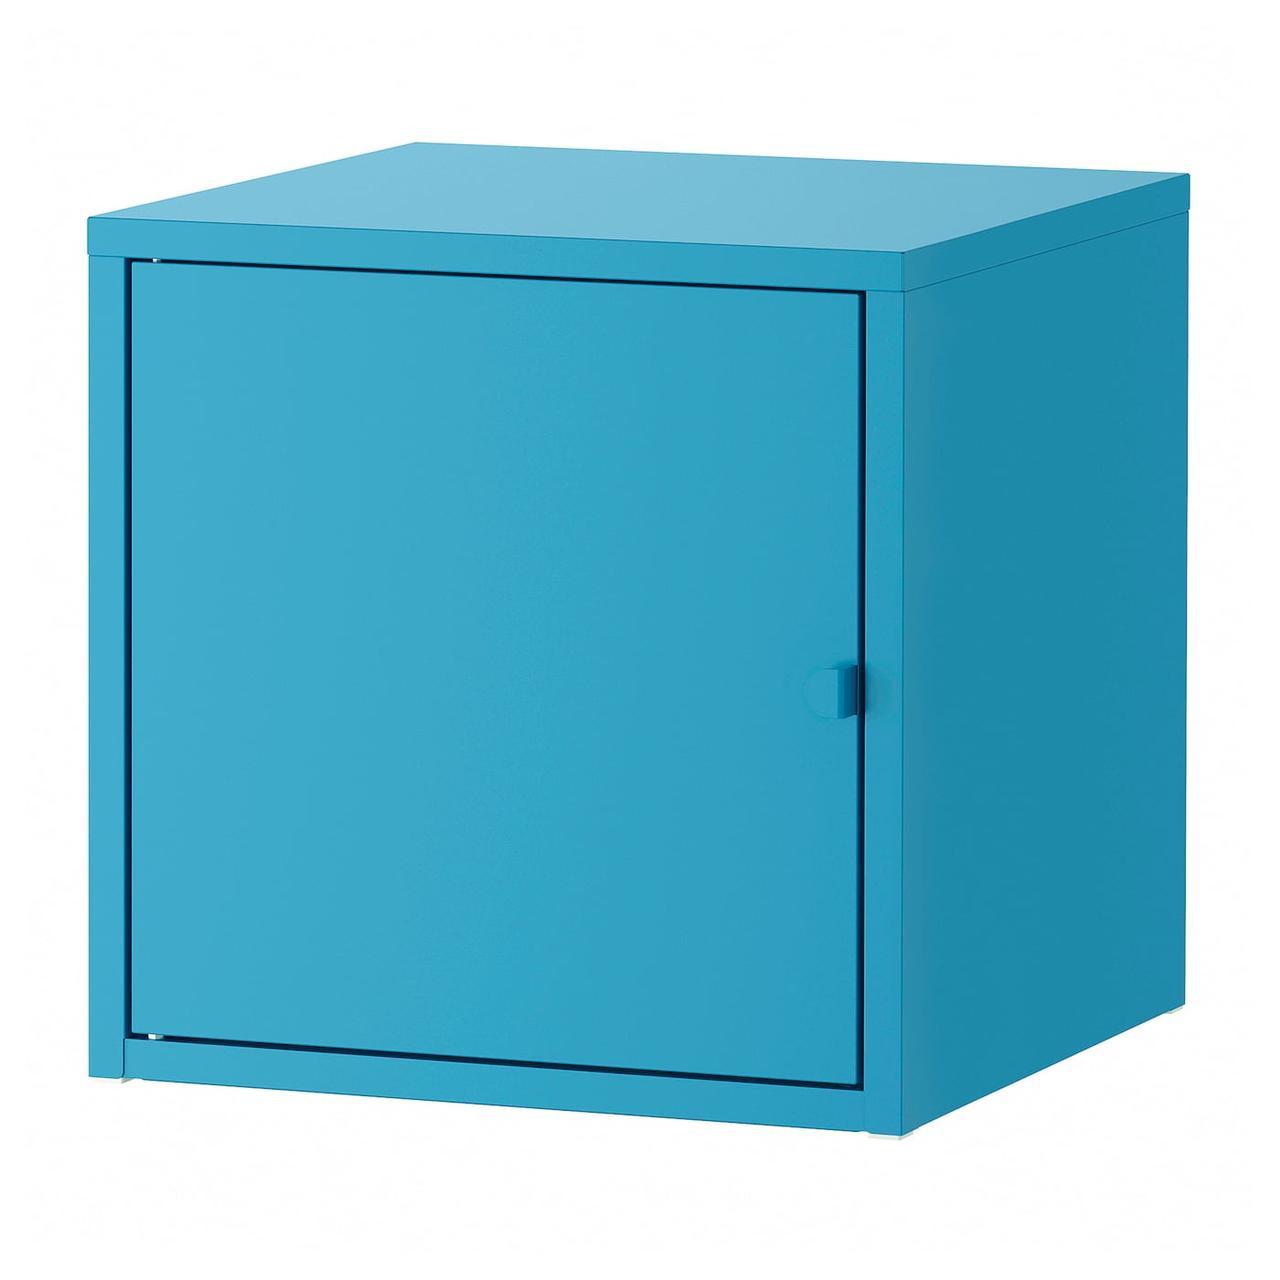 IKEA LIXHULT Шкаф, металл/синий, 35x35 см